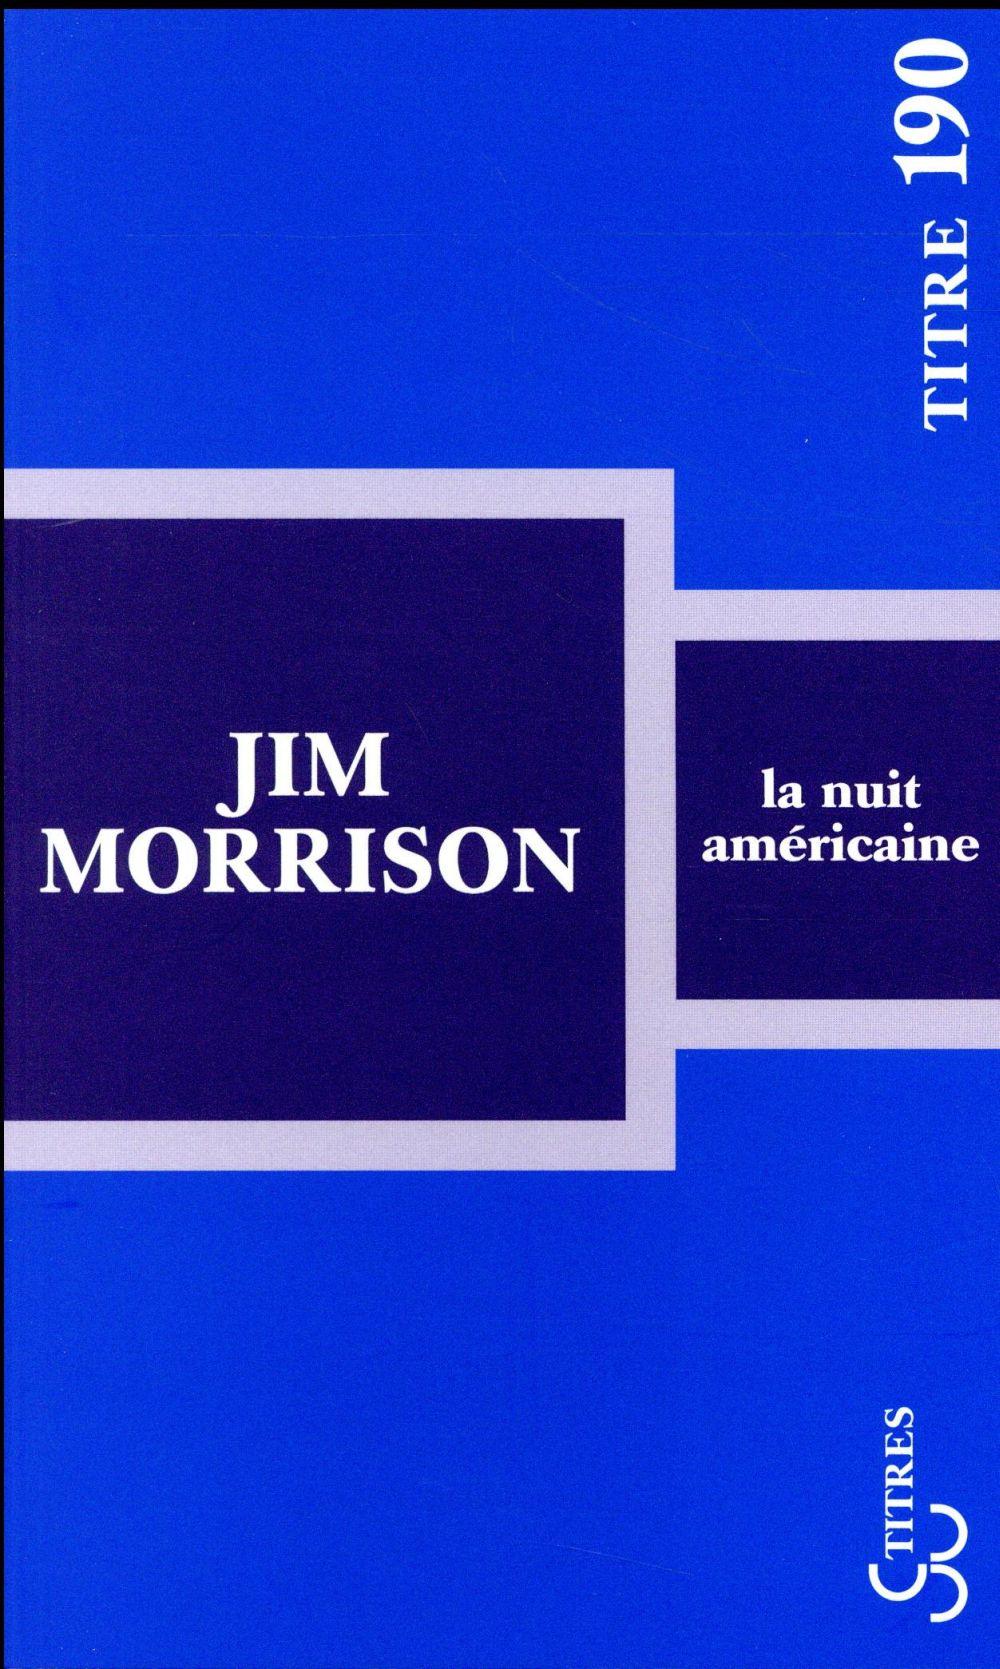 LA NUIT AMERICAINE MORRISON, JIM BOURGOIS